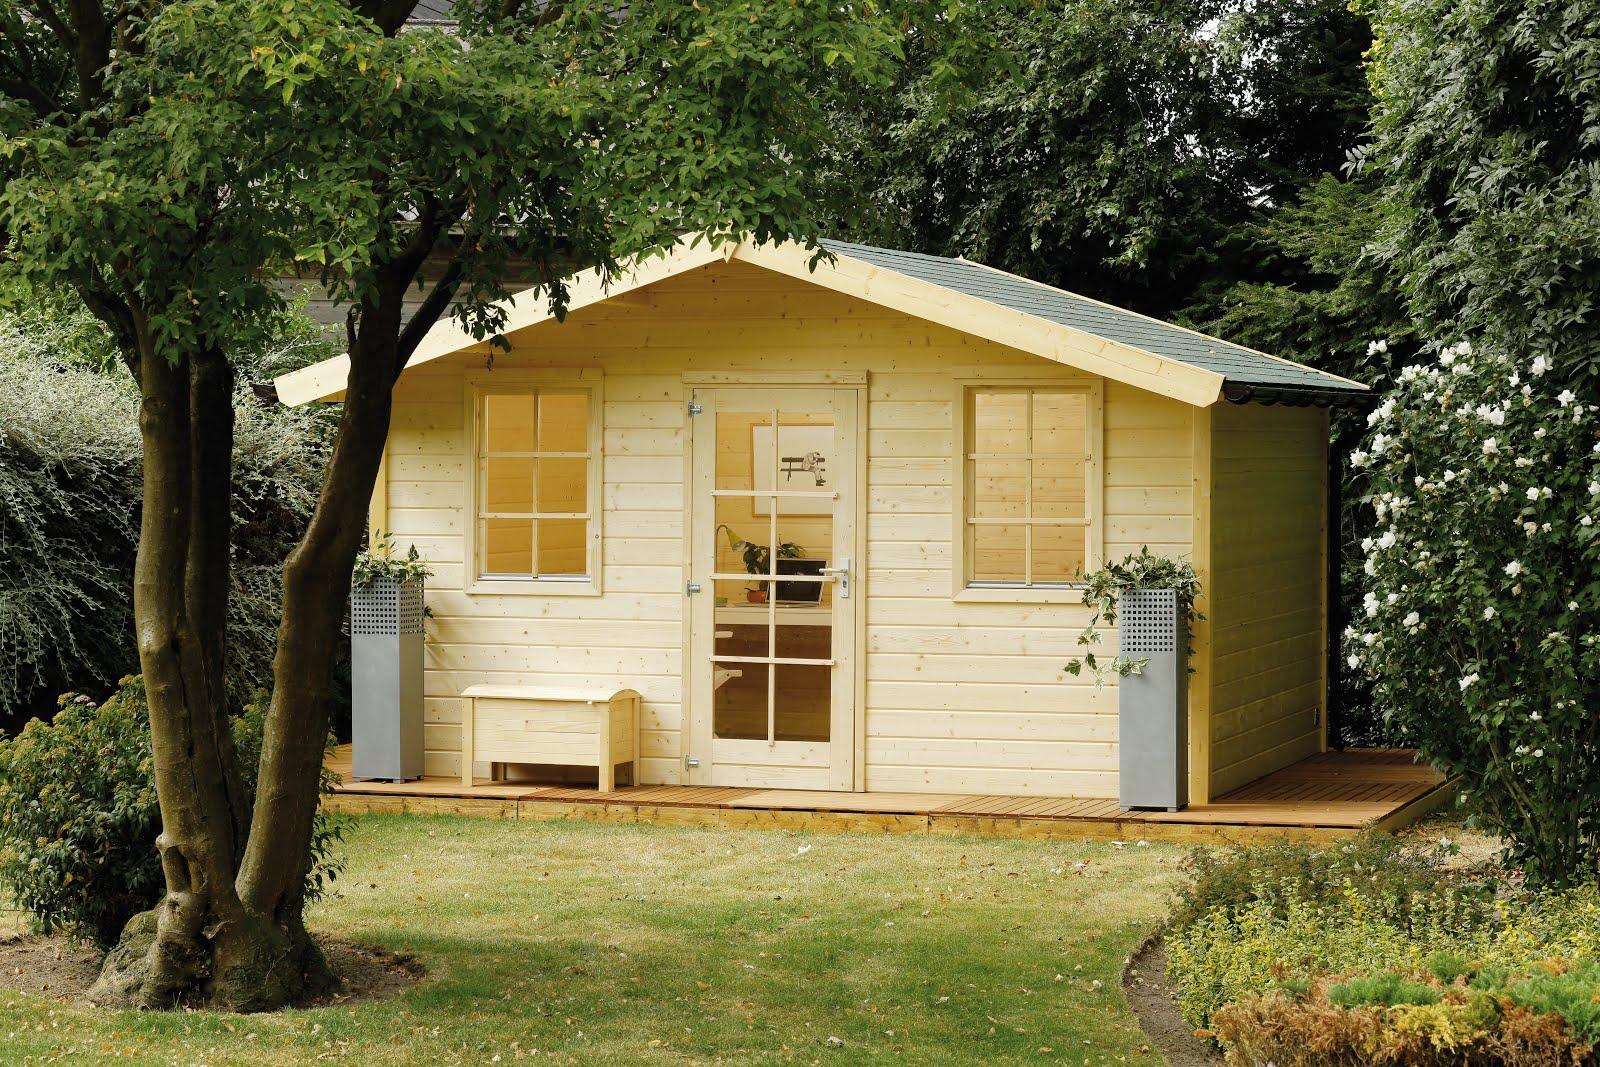 Taxe sur les abris de jardin | Gamm vert